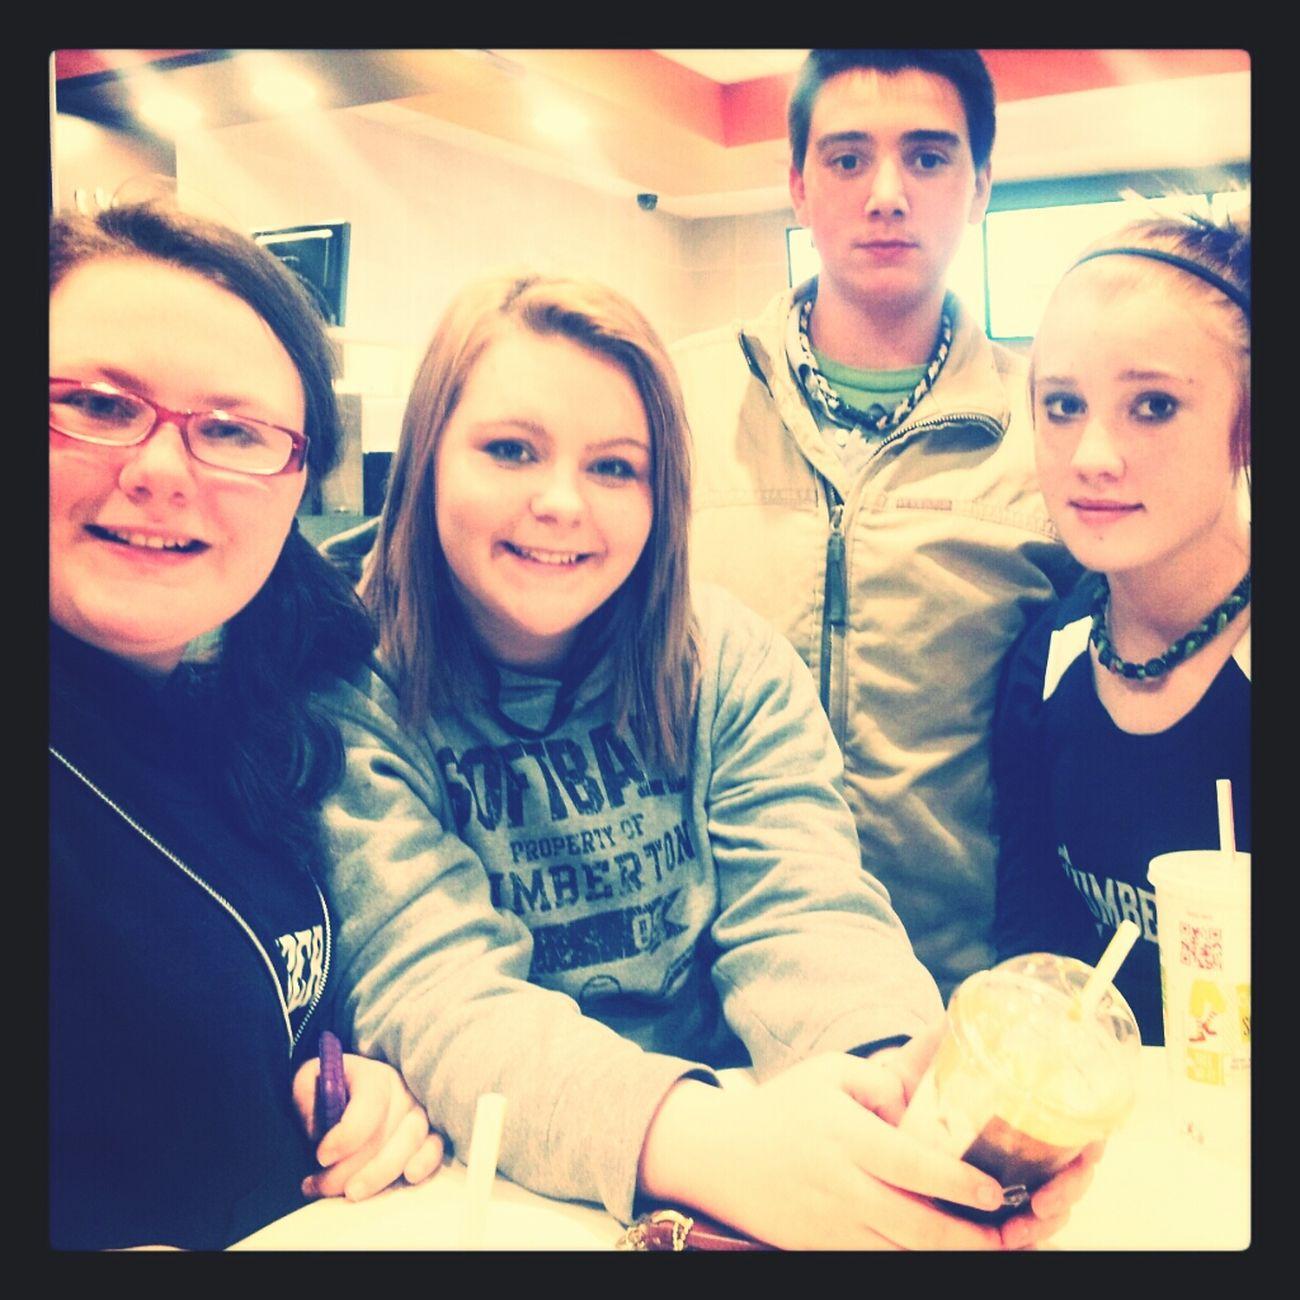 were cool. Haha